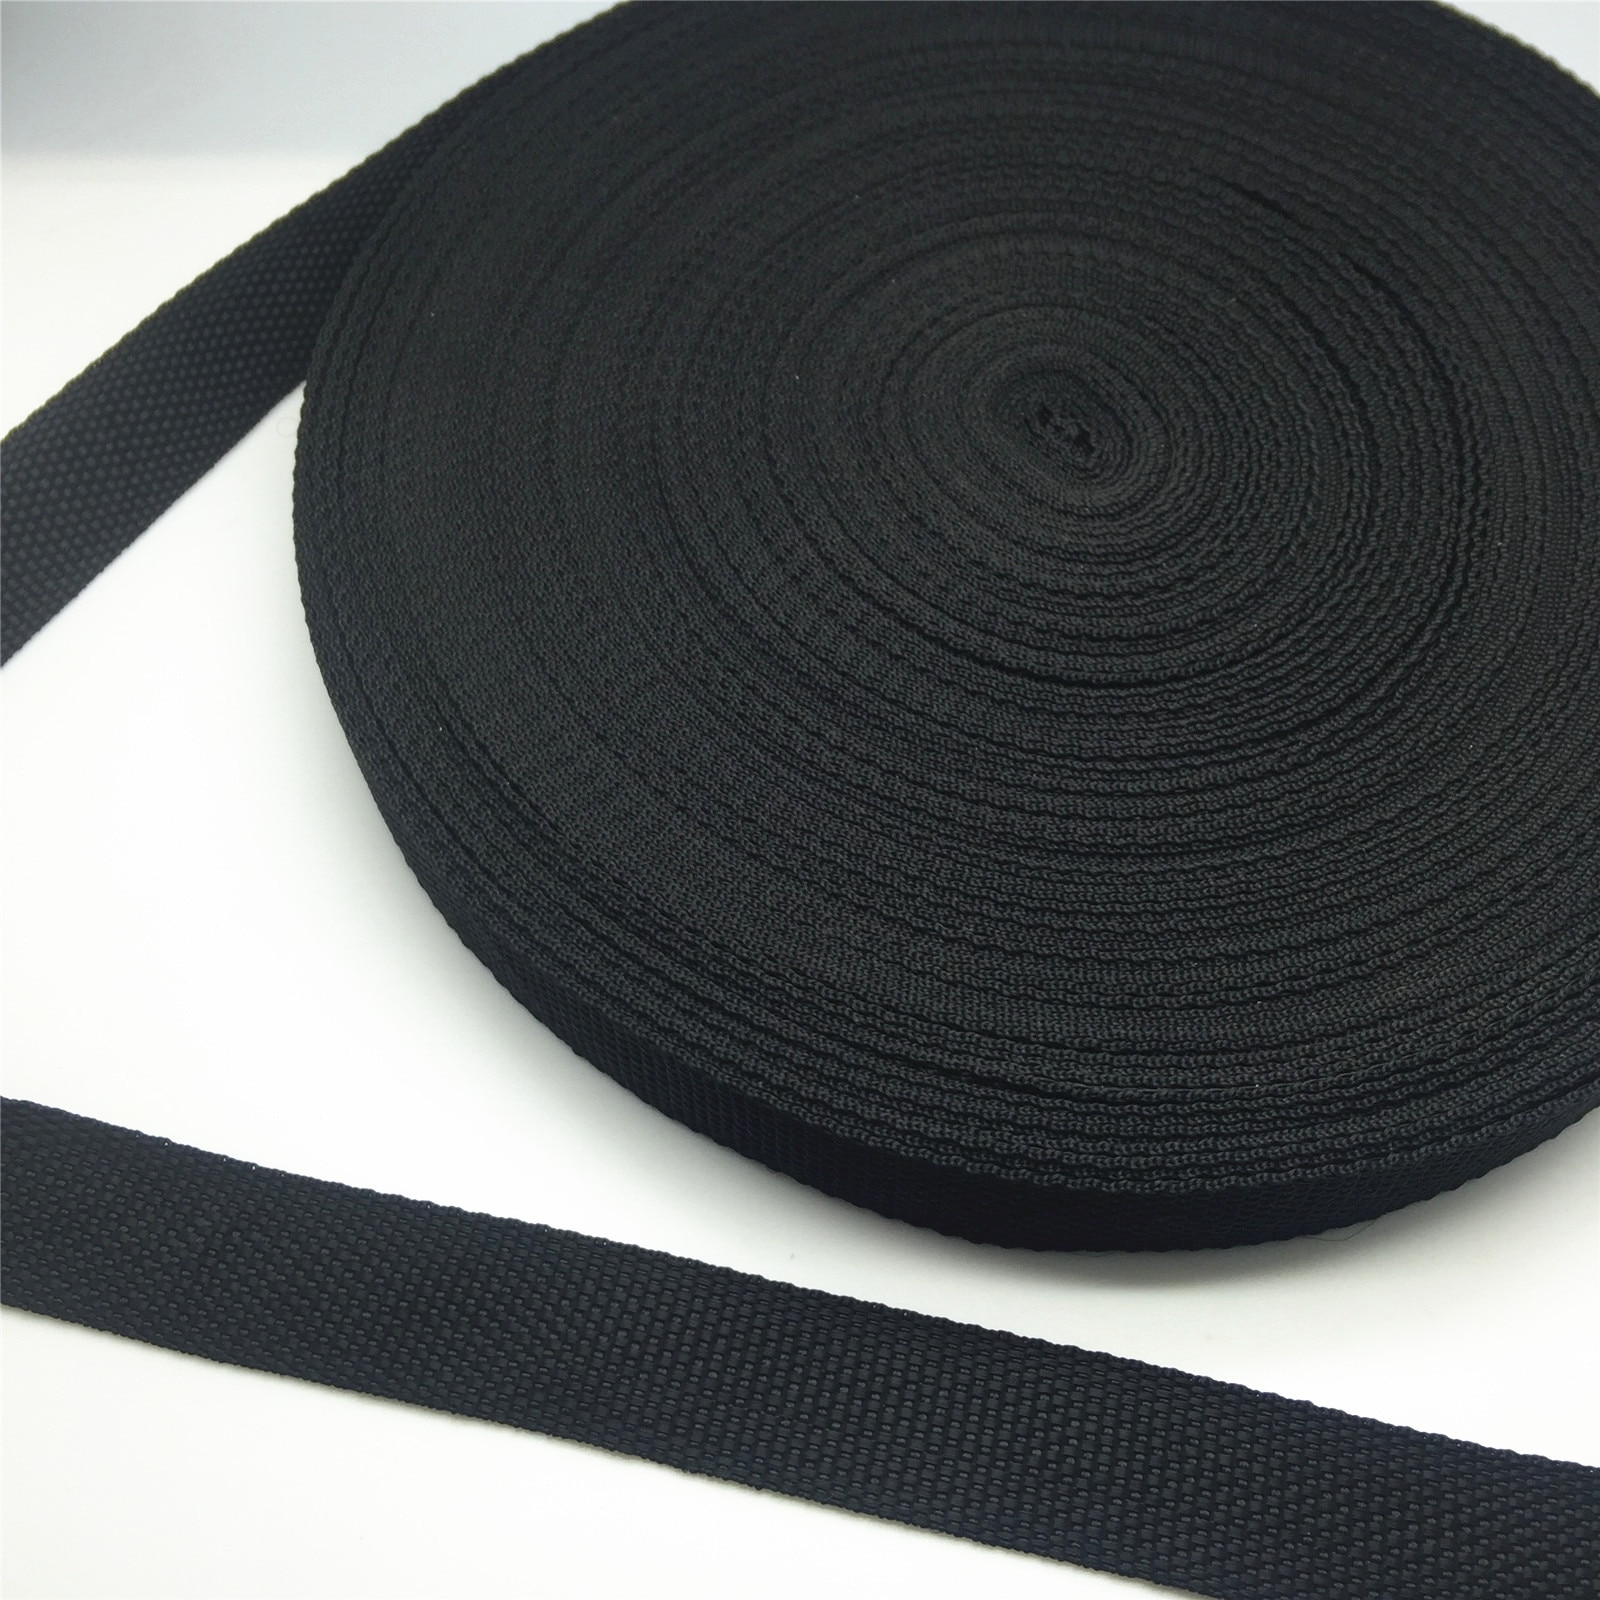 NEW 5Yards 10/15/20/25/30/38/50mm Wide Black Strap Nylon Webbing Knapsack Strapping Safety Belt DIY